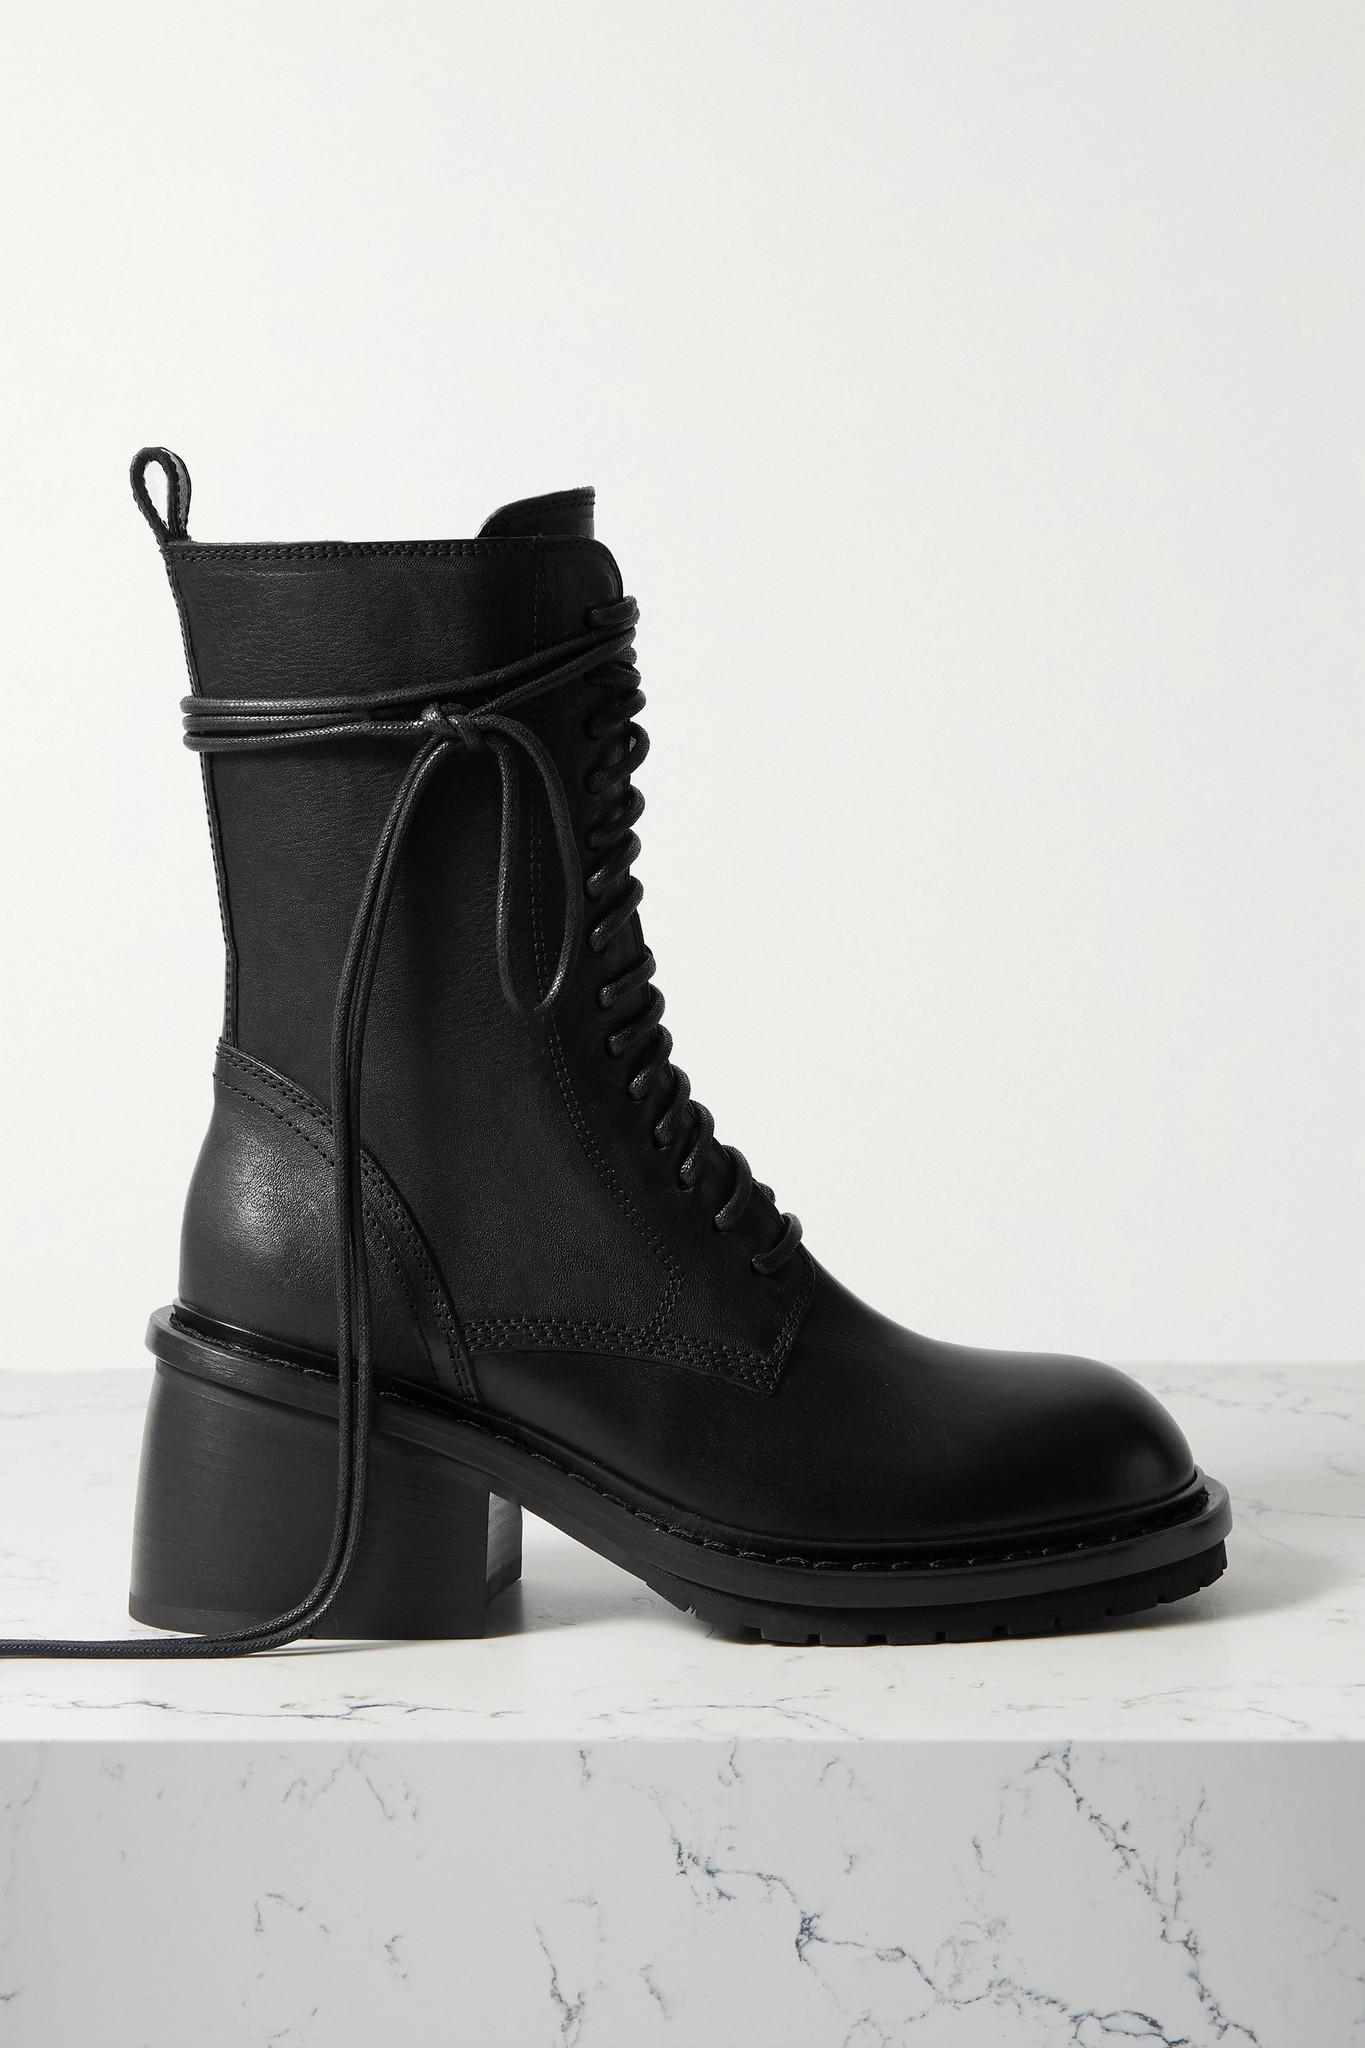 ANN DEMEULEMEESTER - 皮革踝靴 - 黑色 - IT40